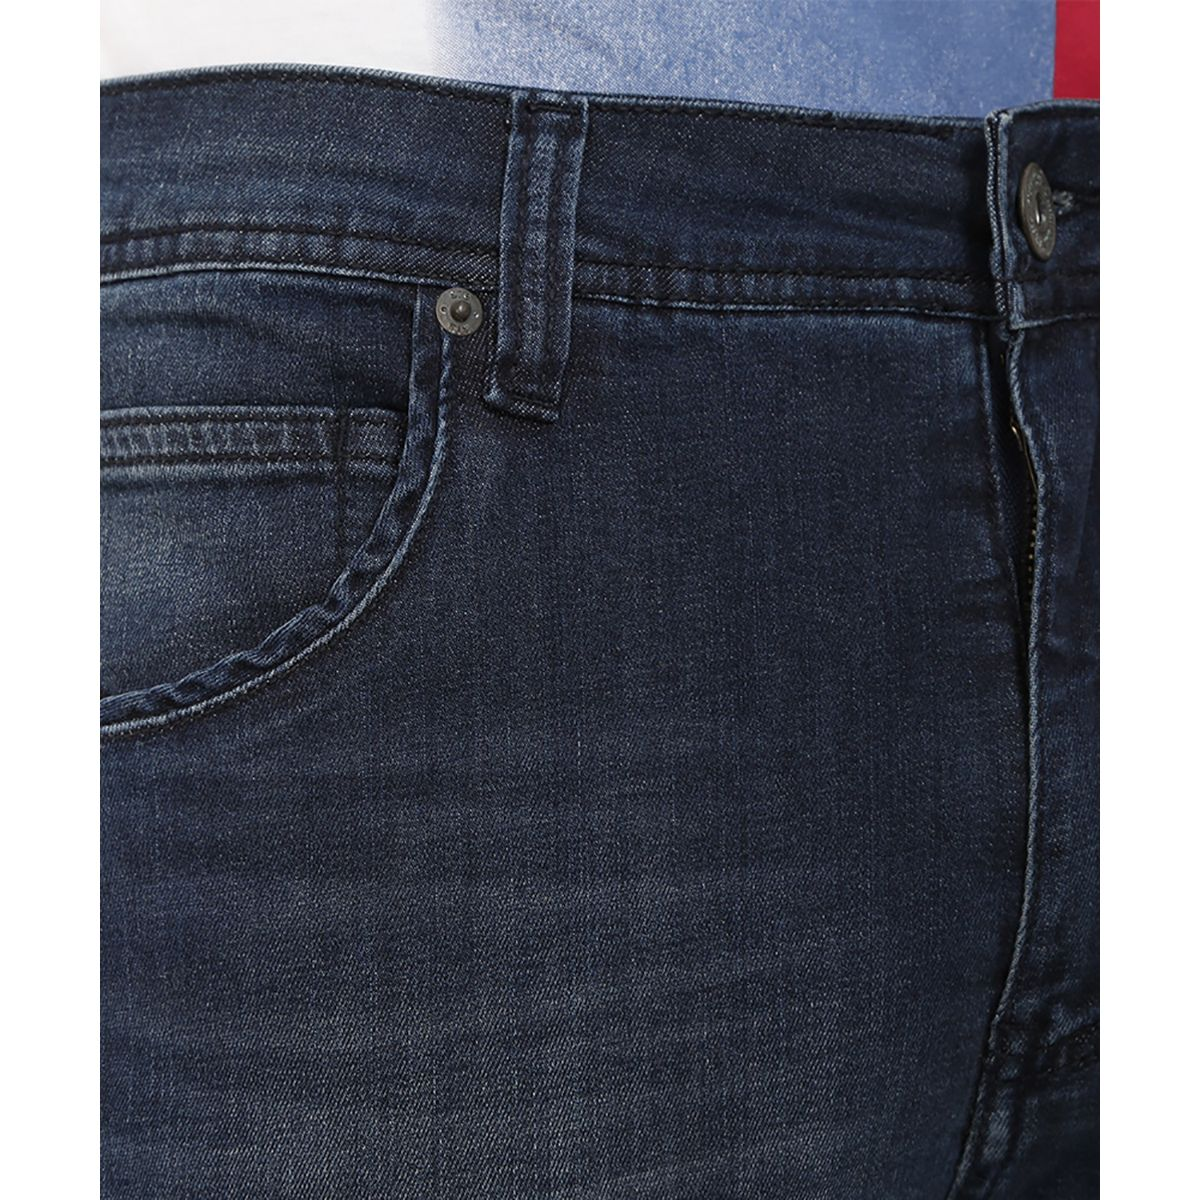 Calca-5-Pockets-Azul---48